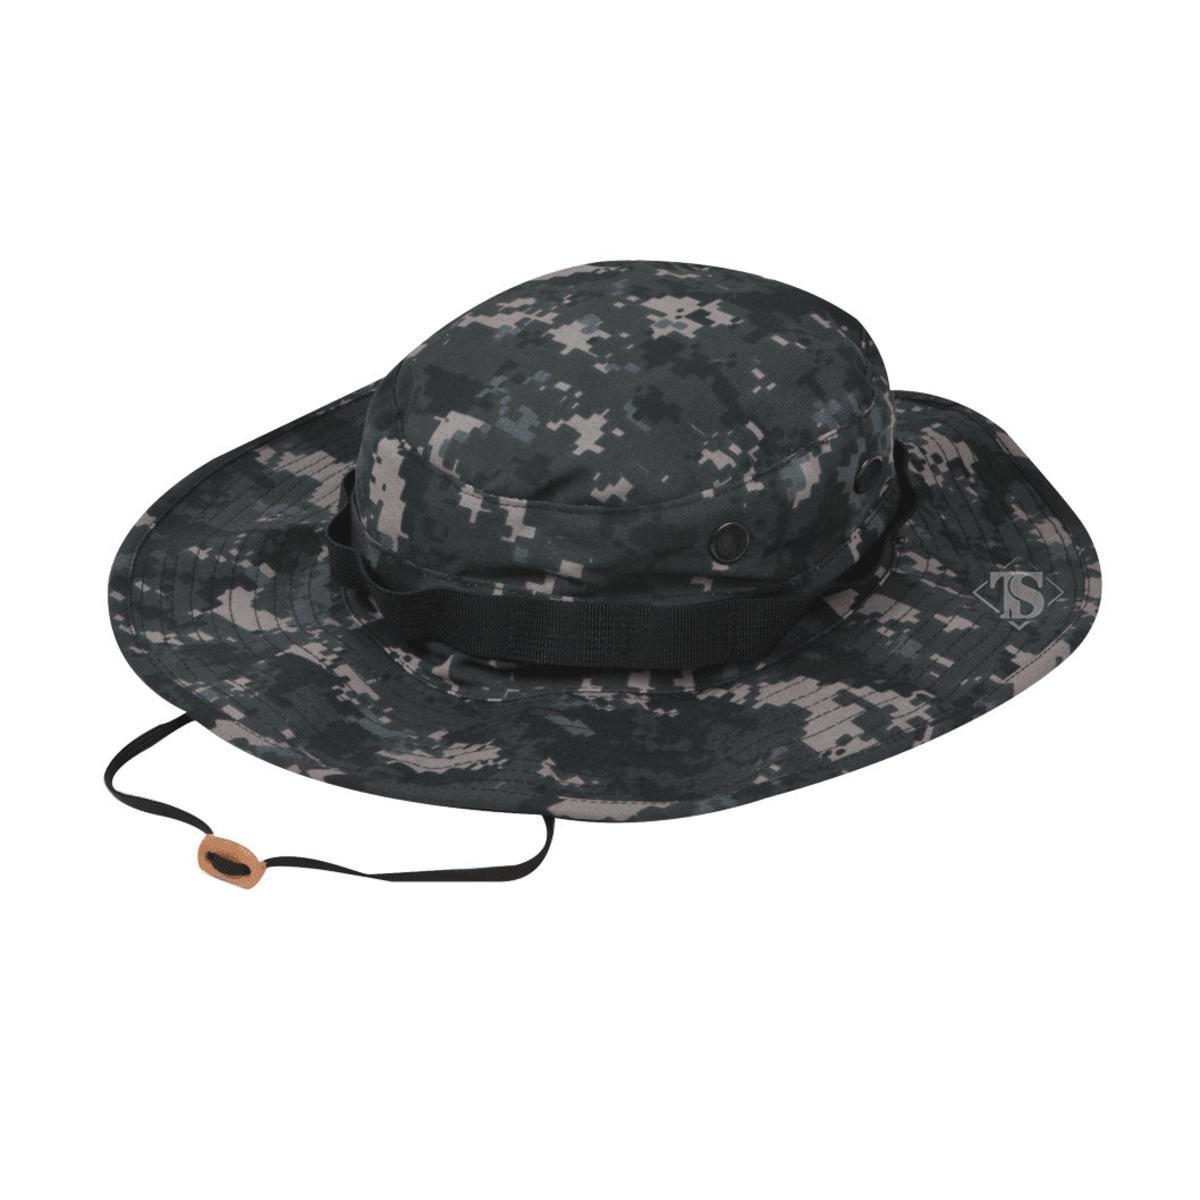 e67f88fab829b sombrero tactico militar boonie tru spec original urban gamu. Cargando zoom.